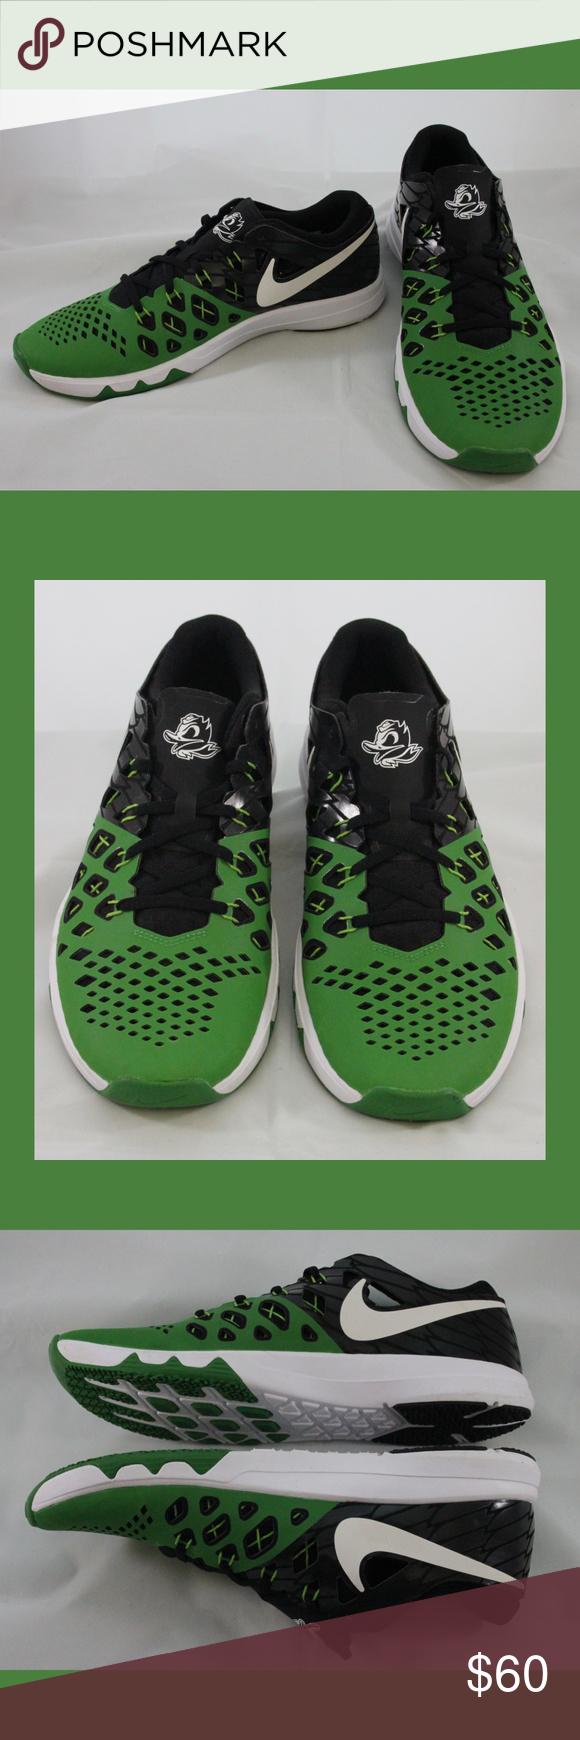 3475e23037f3 Nike Men s Train Speed 4 AMP Shoes Oregon Ducks 12 These Nike training  sneakers (844102